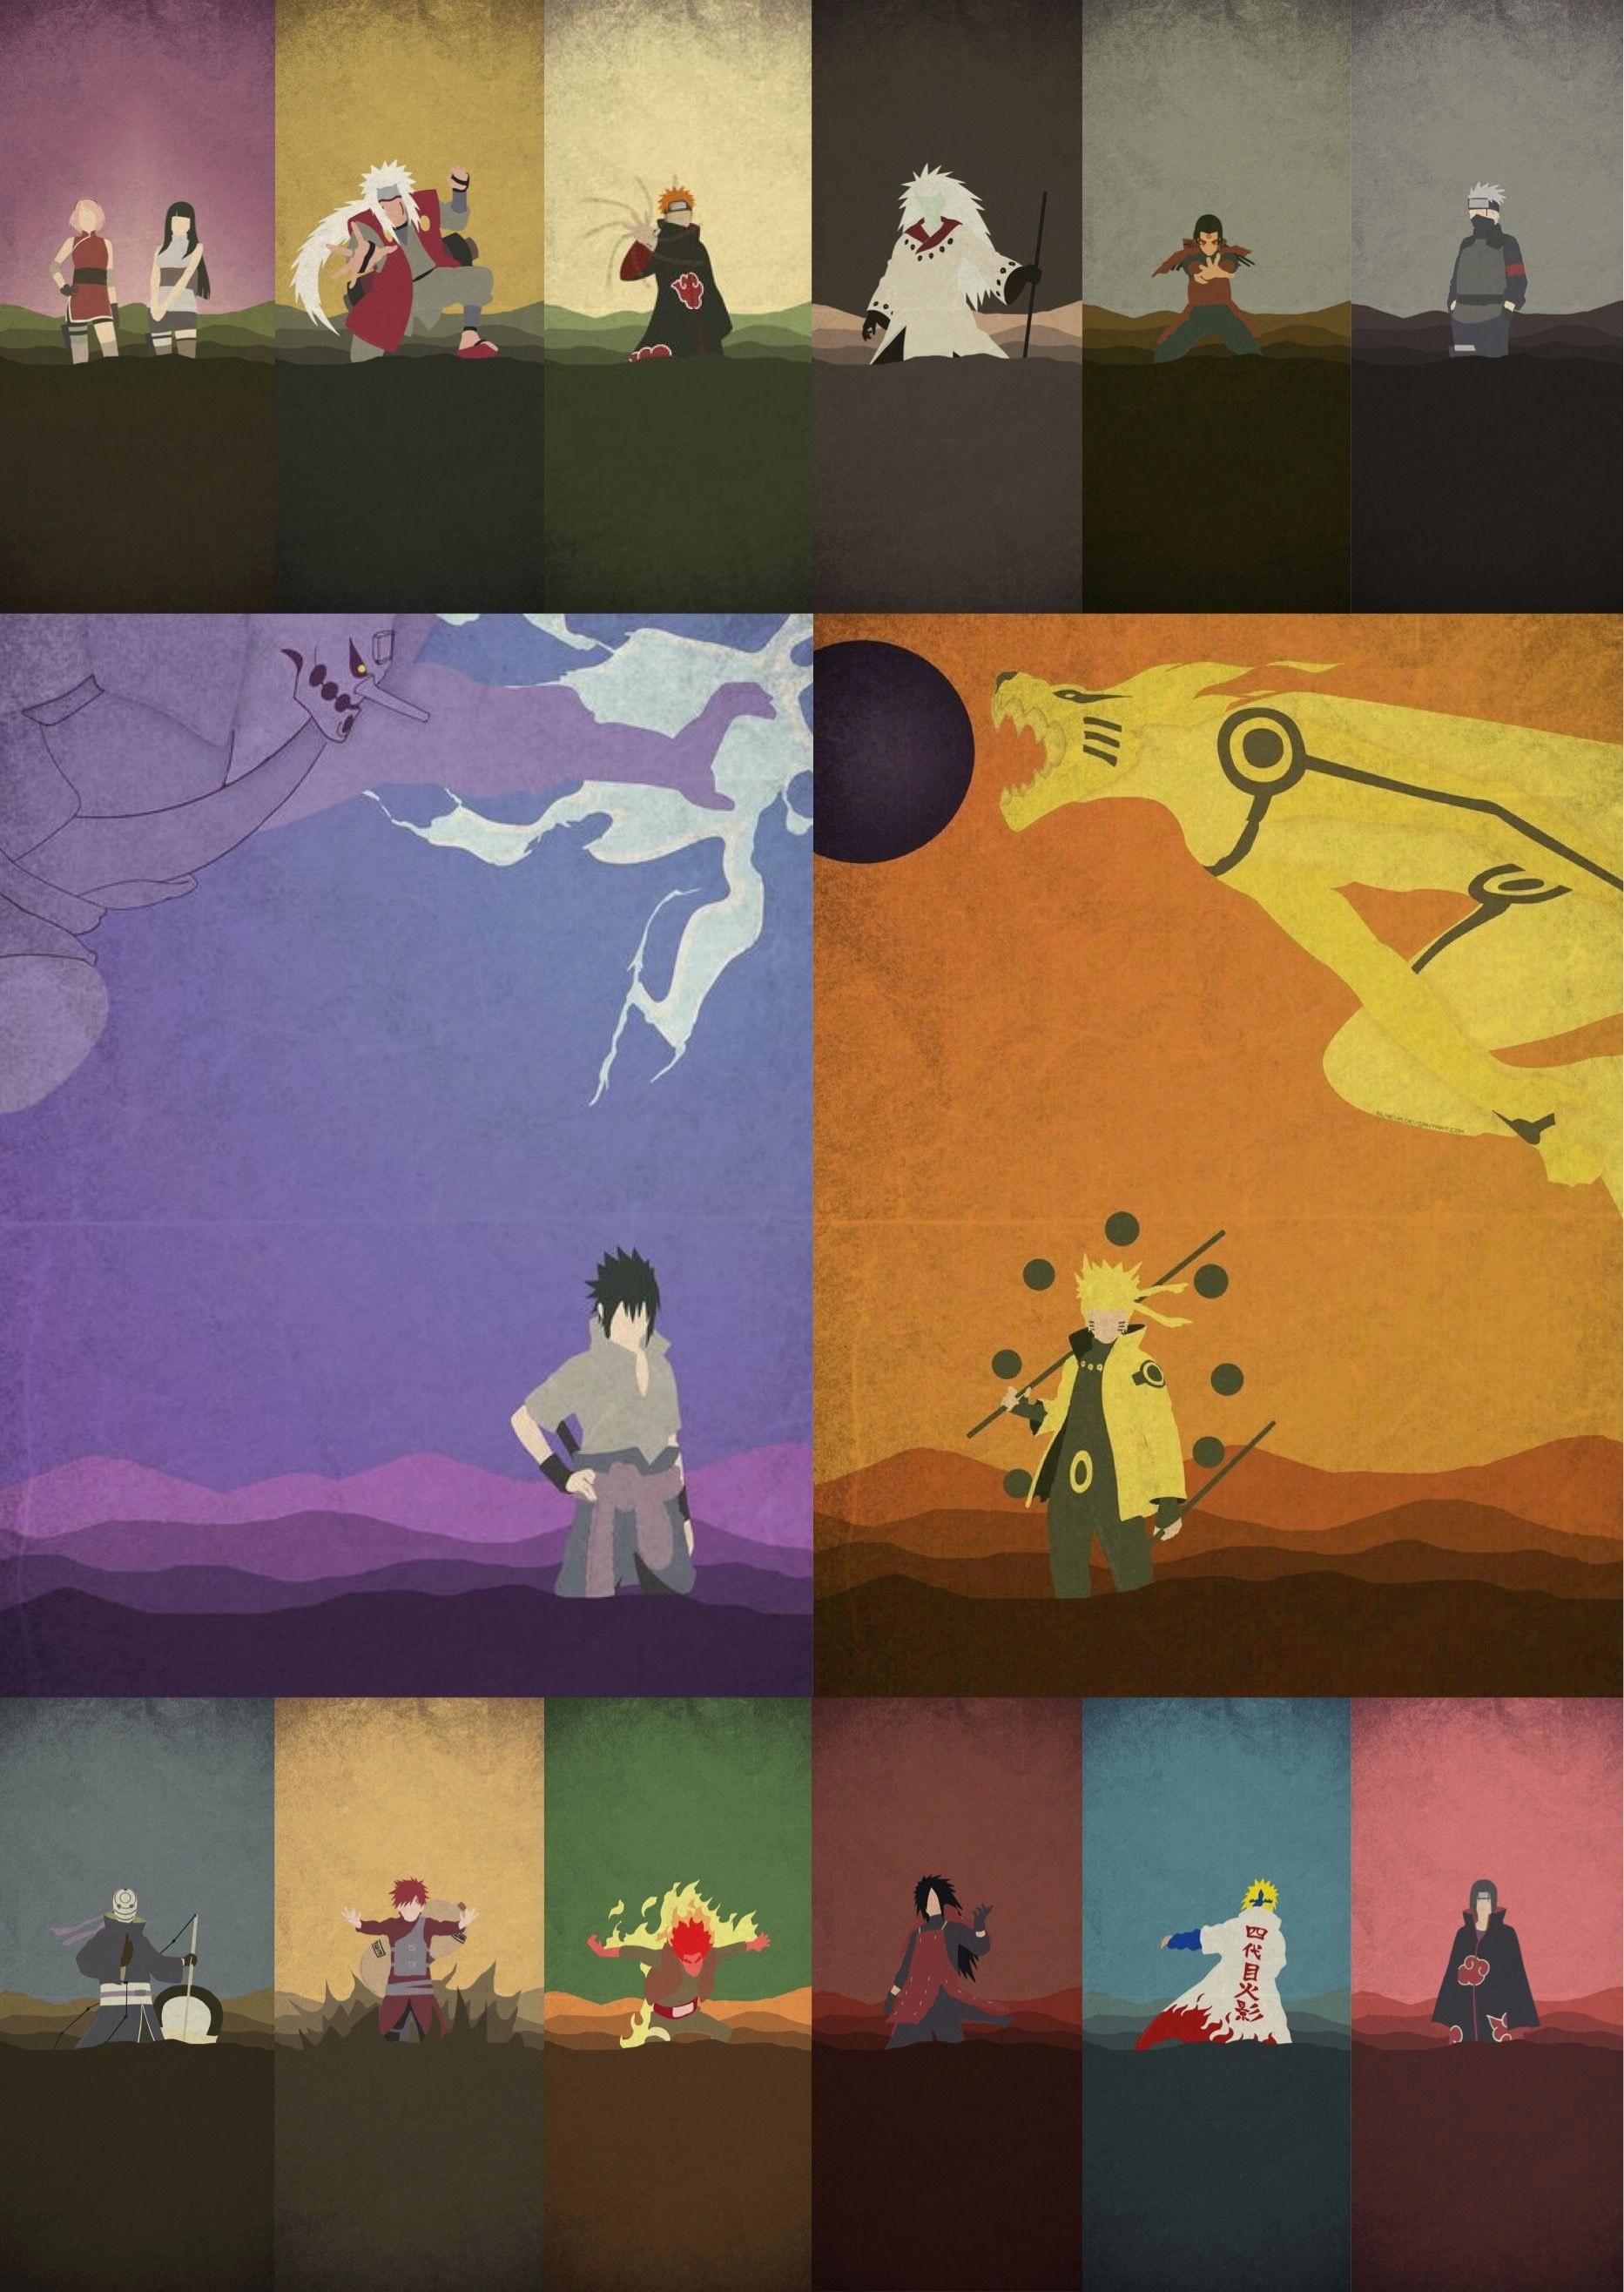 10+ Naruto Minimalist Iphone Wallpaper - Bizt Wallpaper